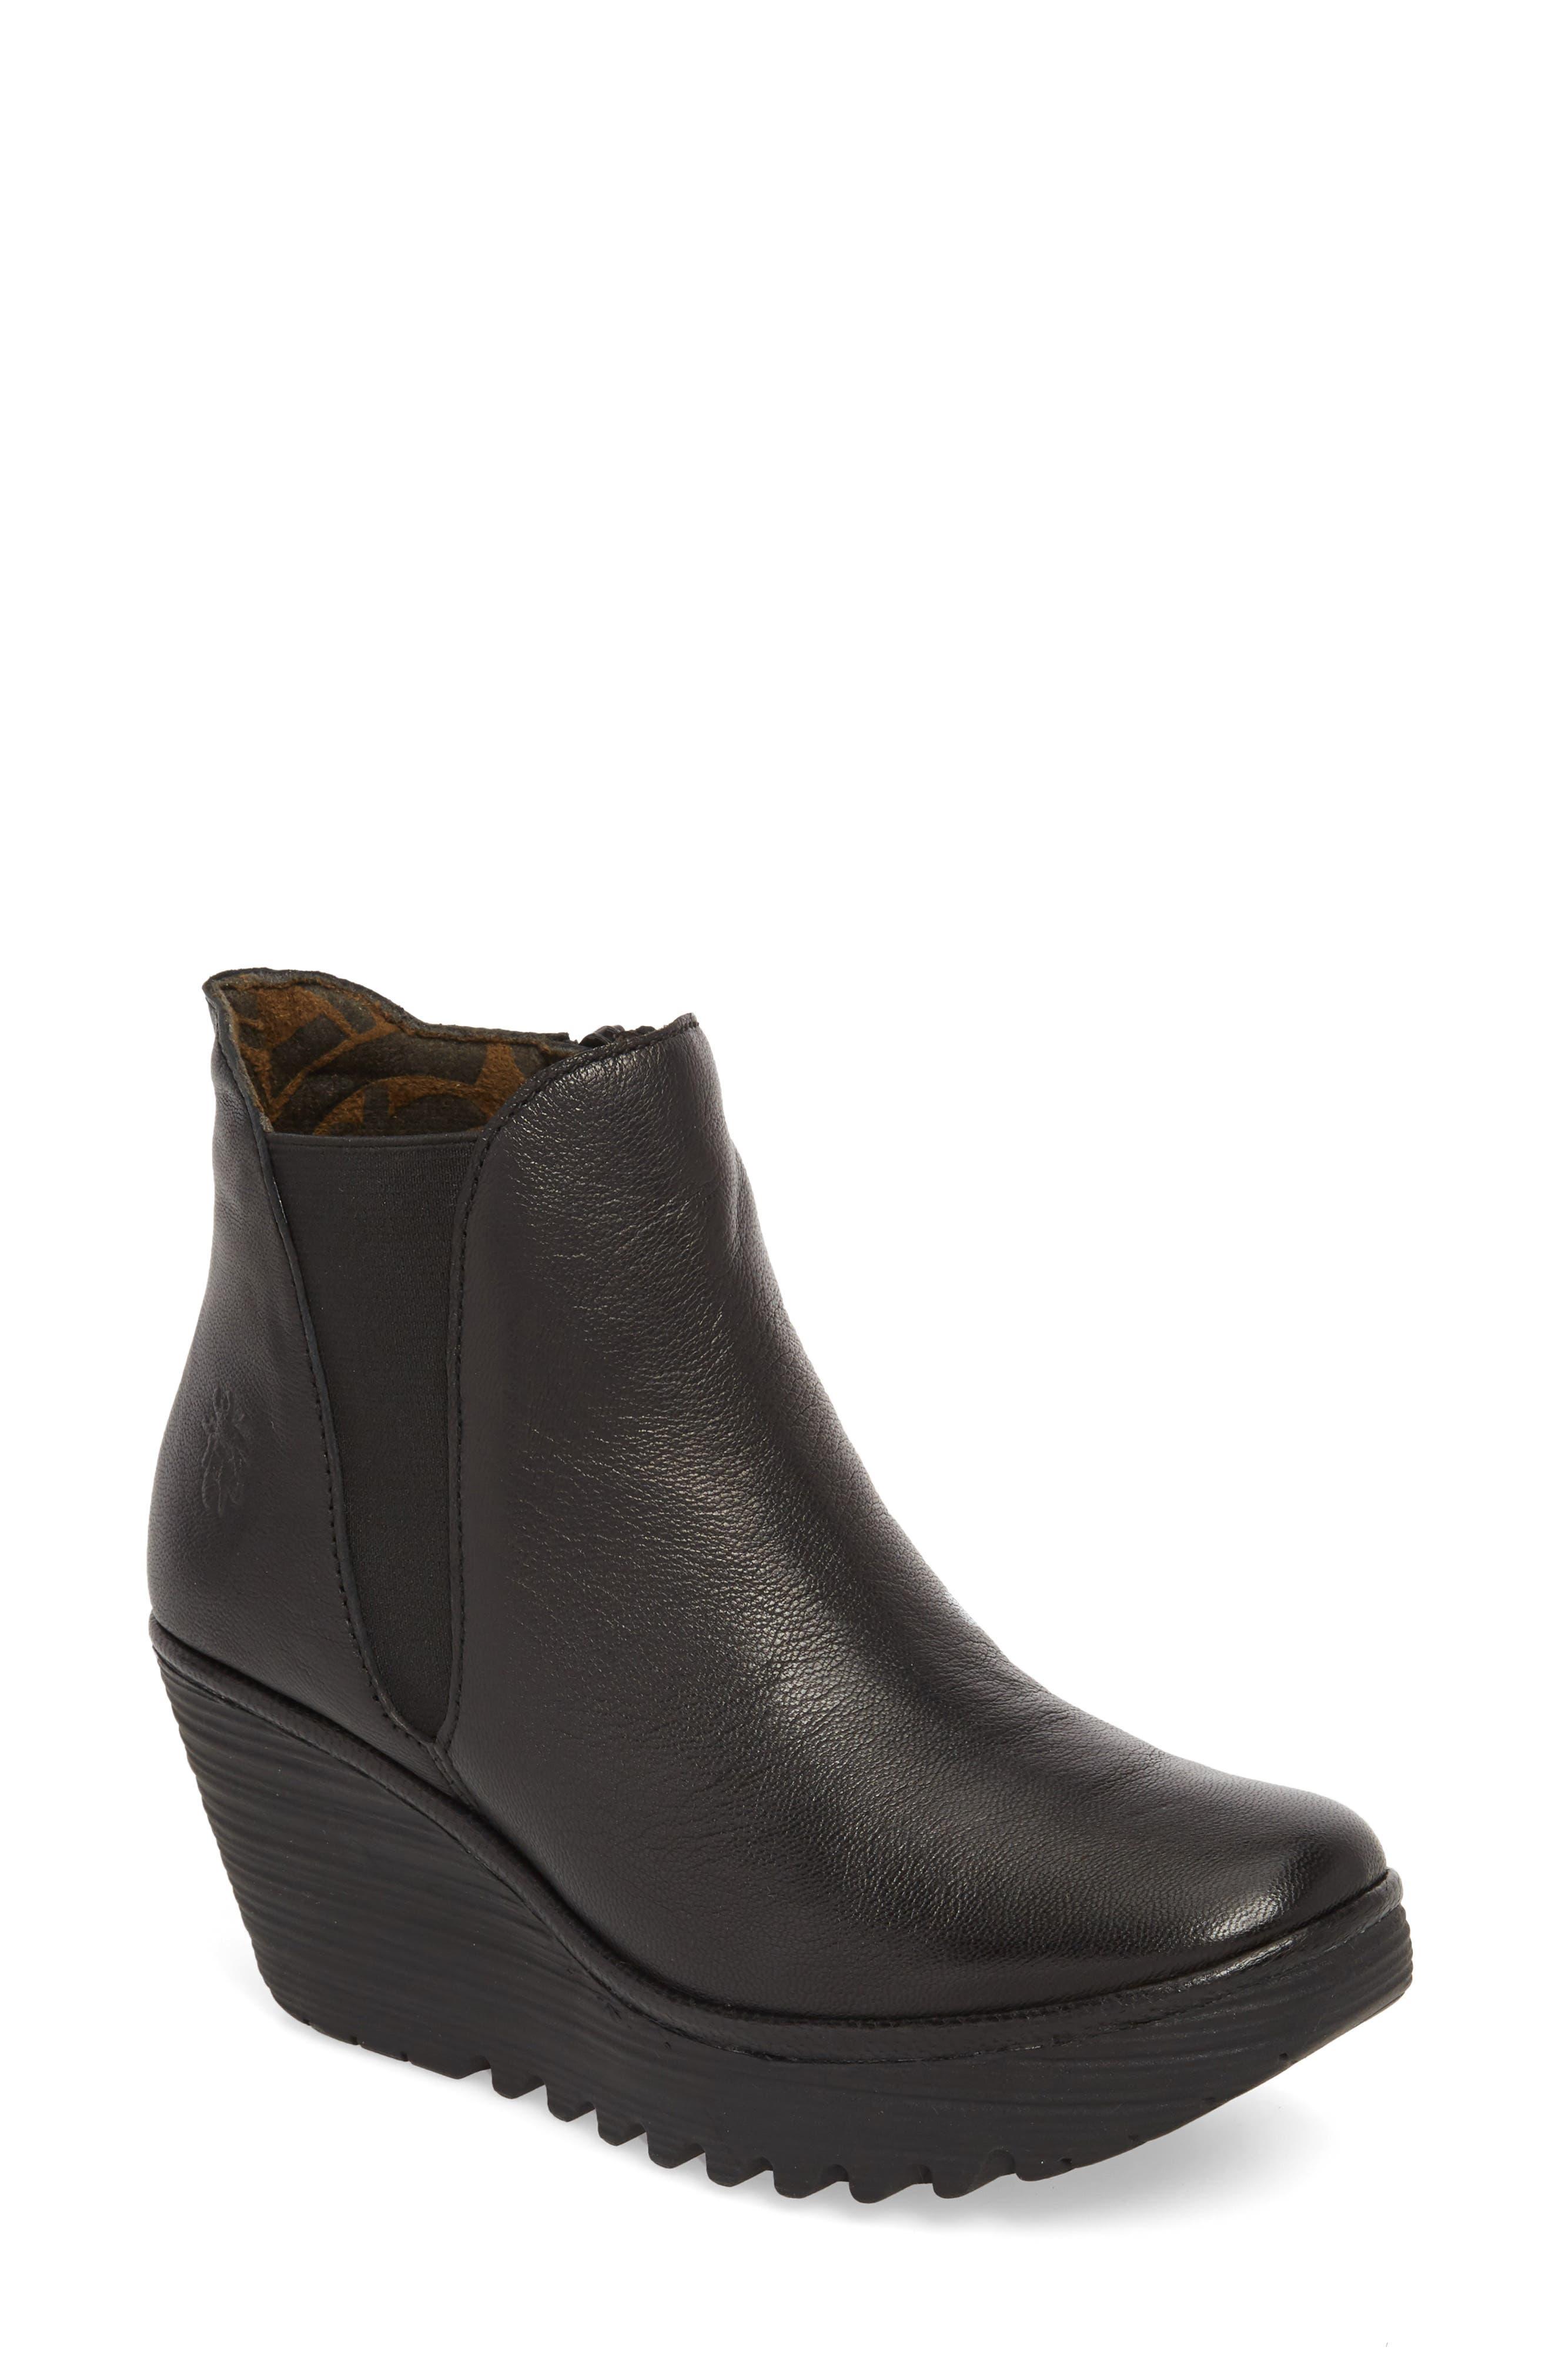 FLY LONDON Yozo Wedge Boot, Main, color, BLACK